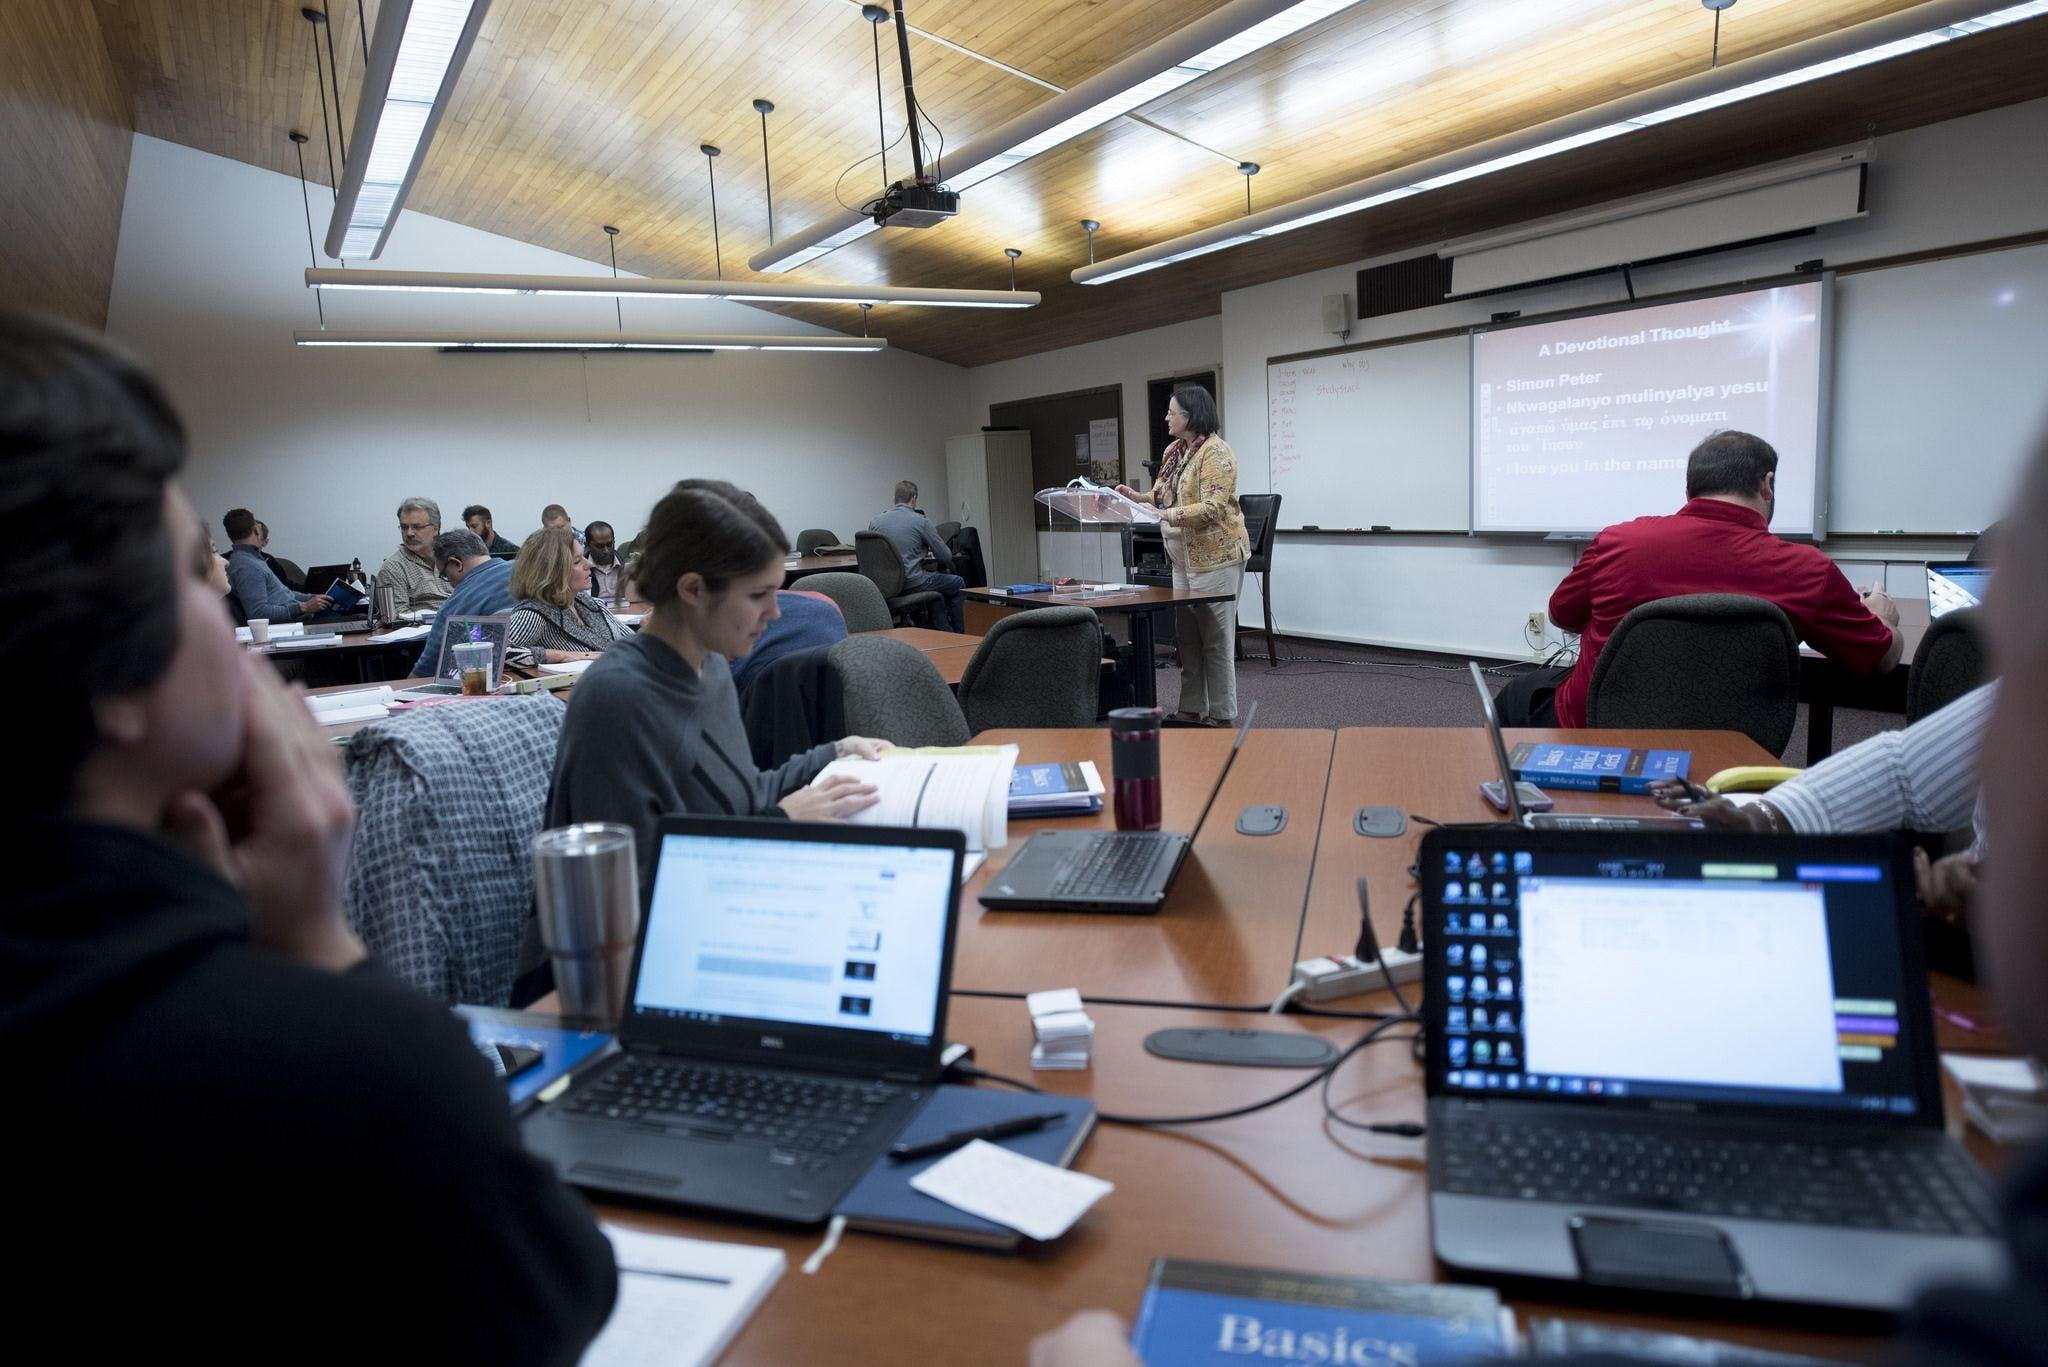 Seminary Partnership Helps Student Pursue His Calling